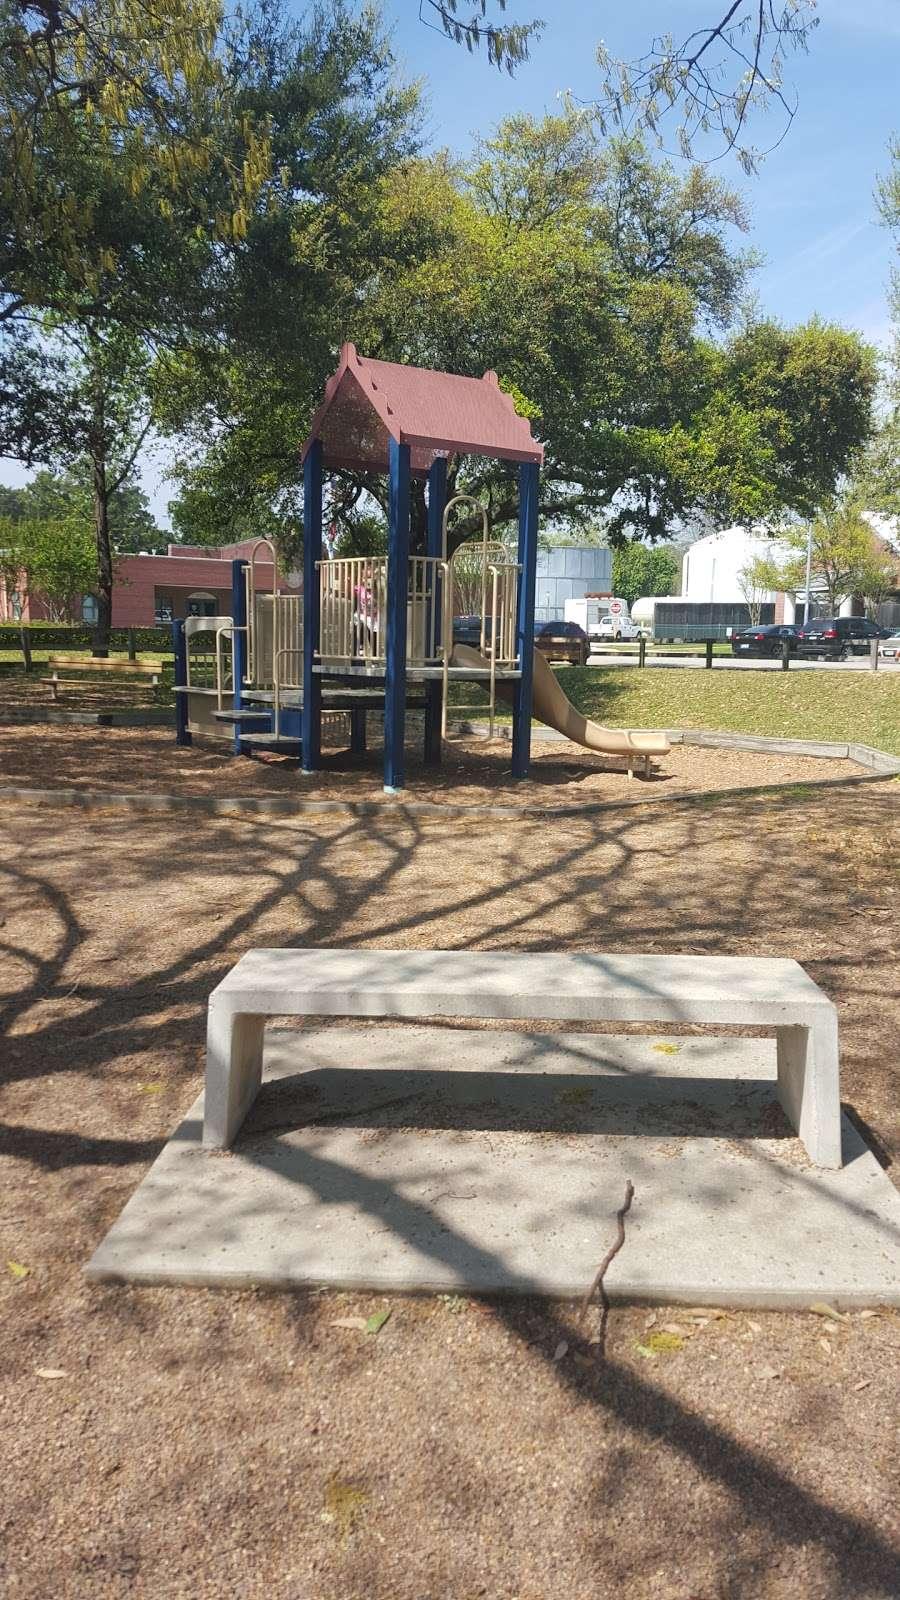 Spring Valley Village City Park - park    Photo 2 of 10   Address: 1025 Campbell Rd, Houston, TX 77055, USA   Phone: (713) 465-8308